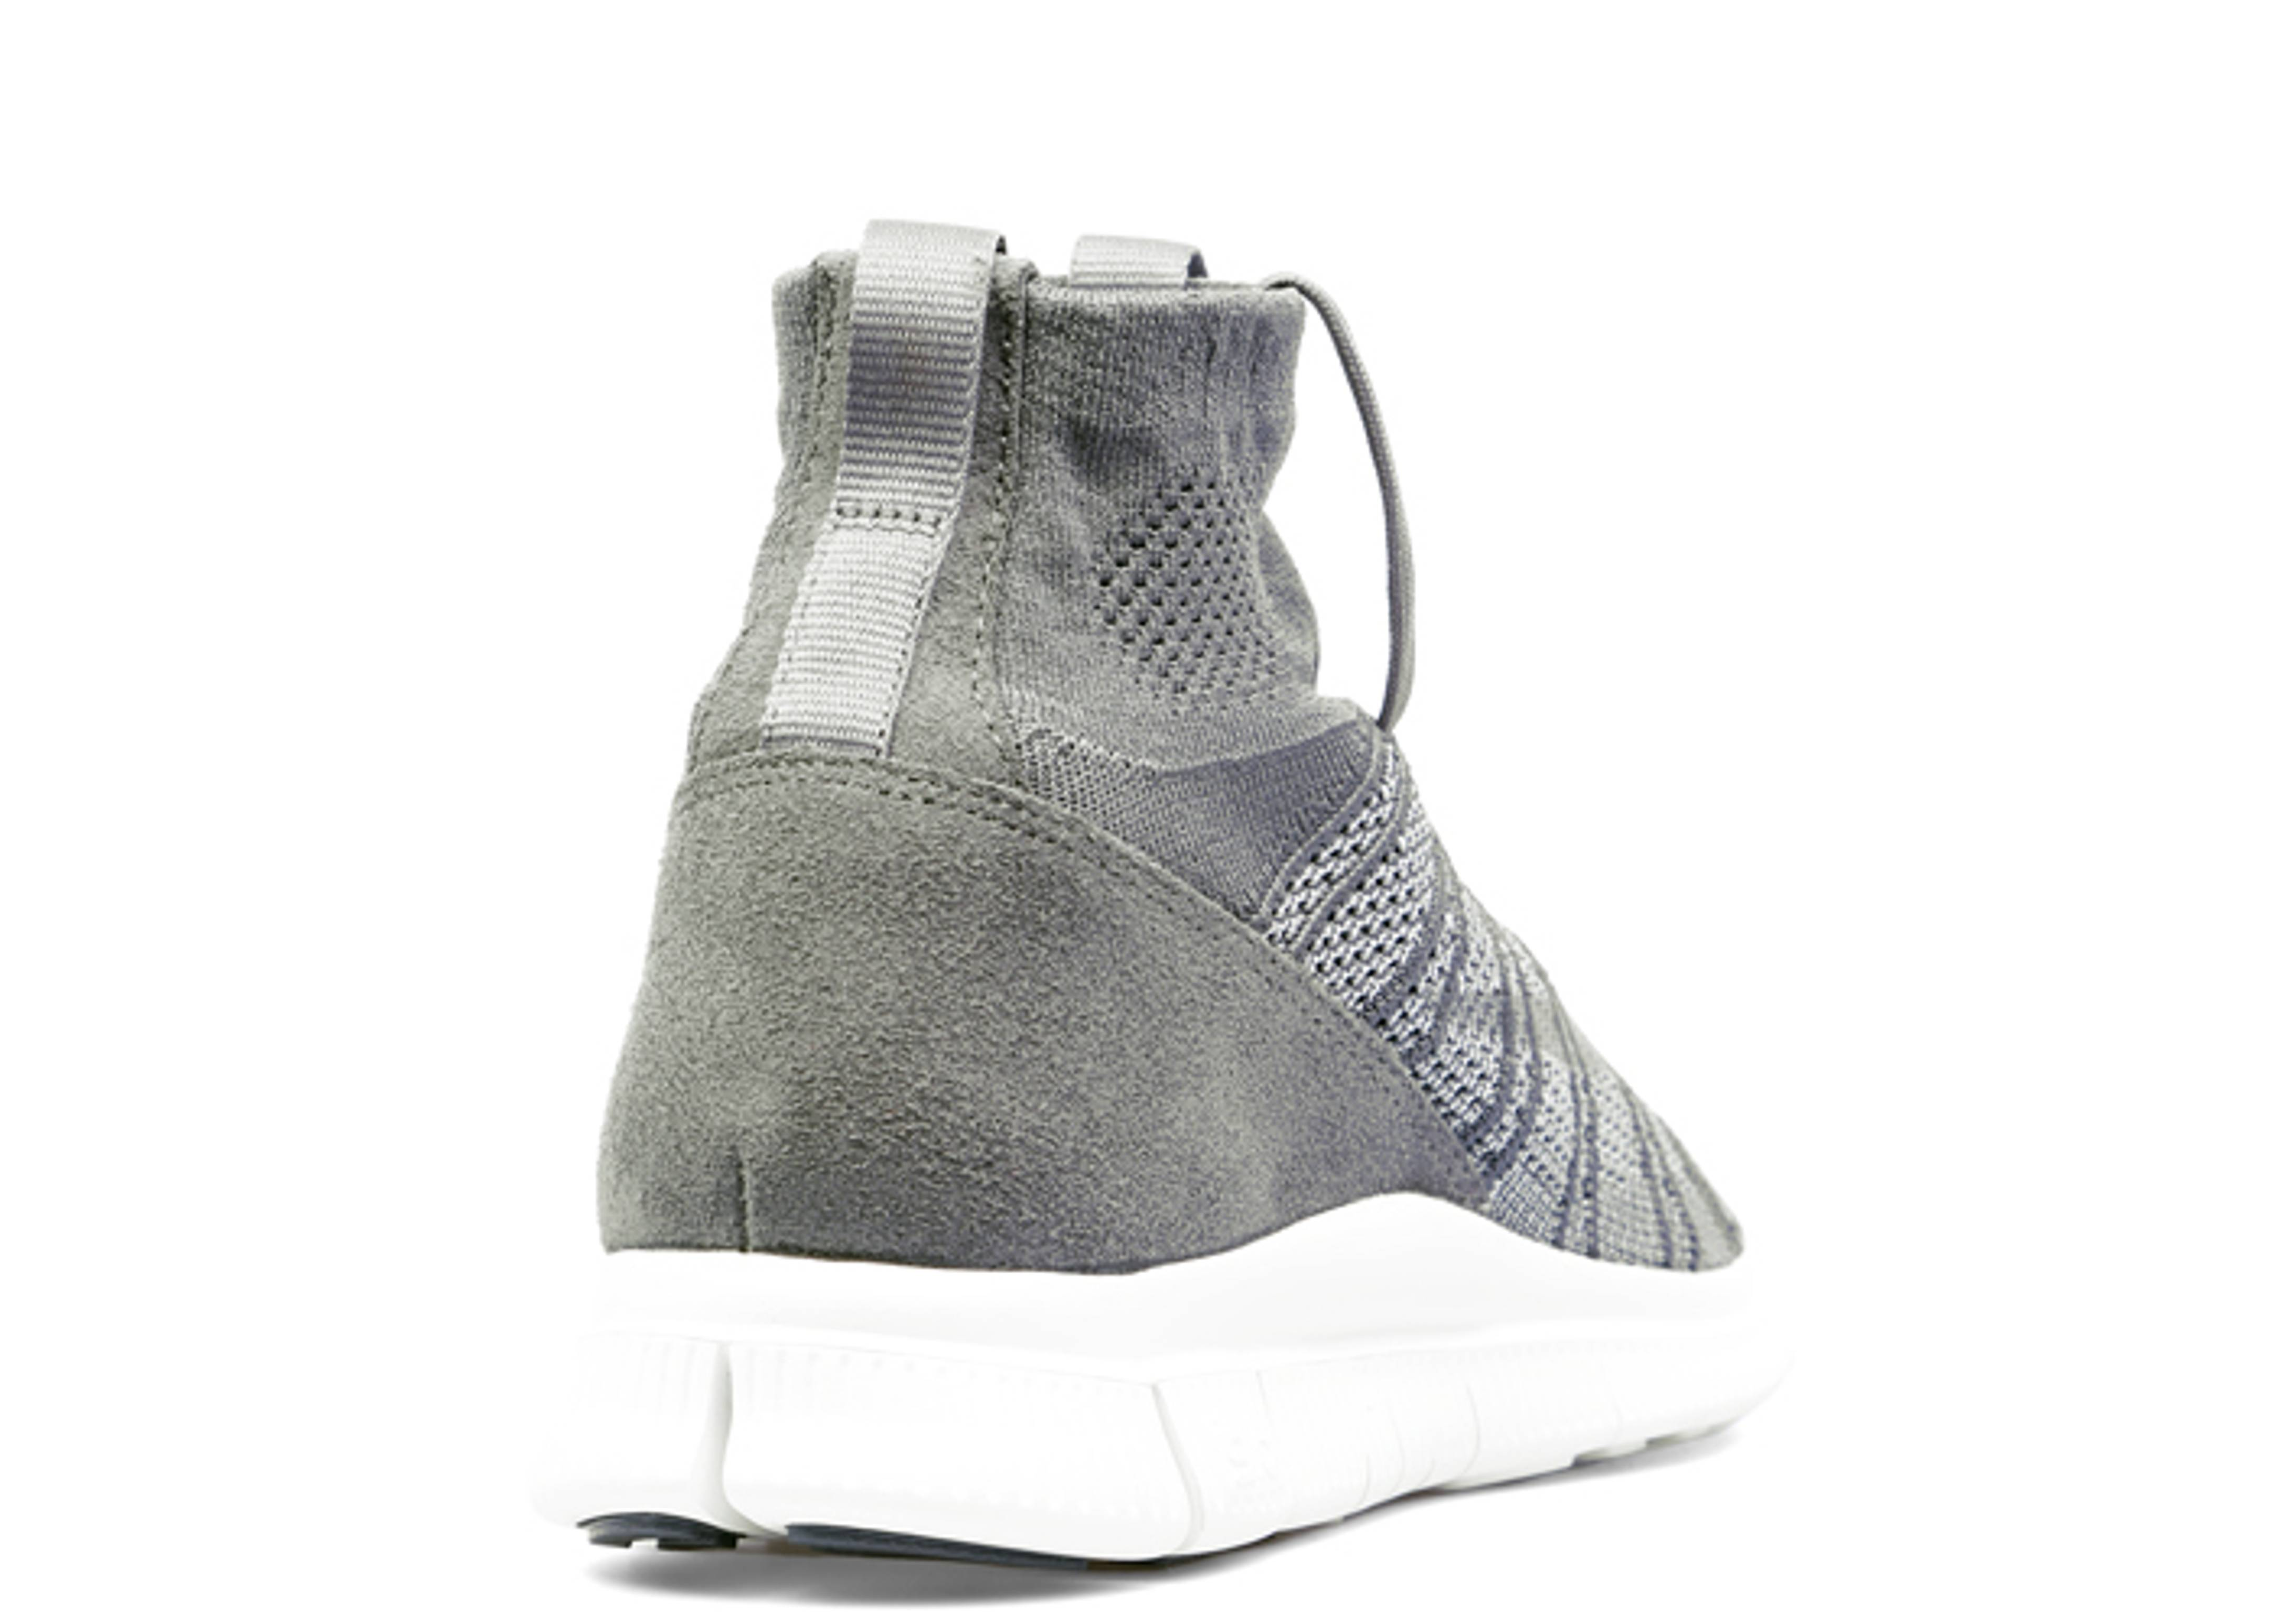 83e4c05f4564 Free Flyknit Mercurial Sp - Nike - 667978 009 - dark grey wolf-smmt white